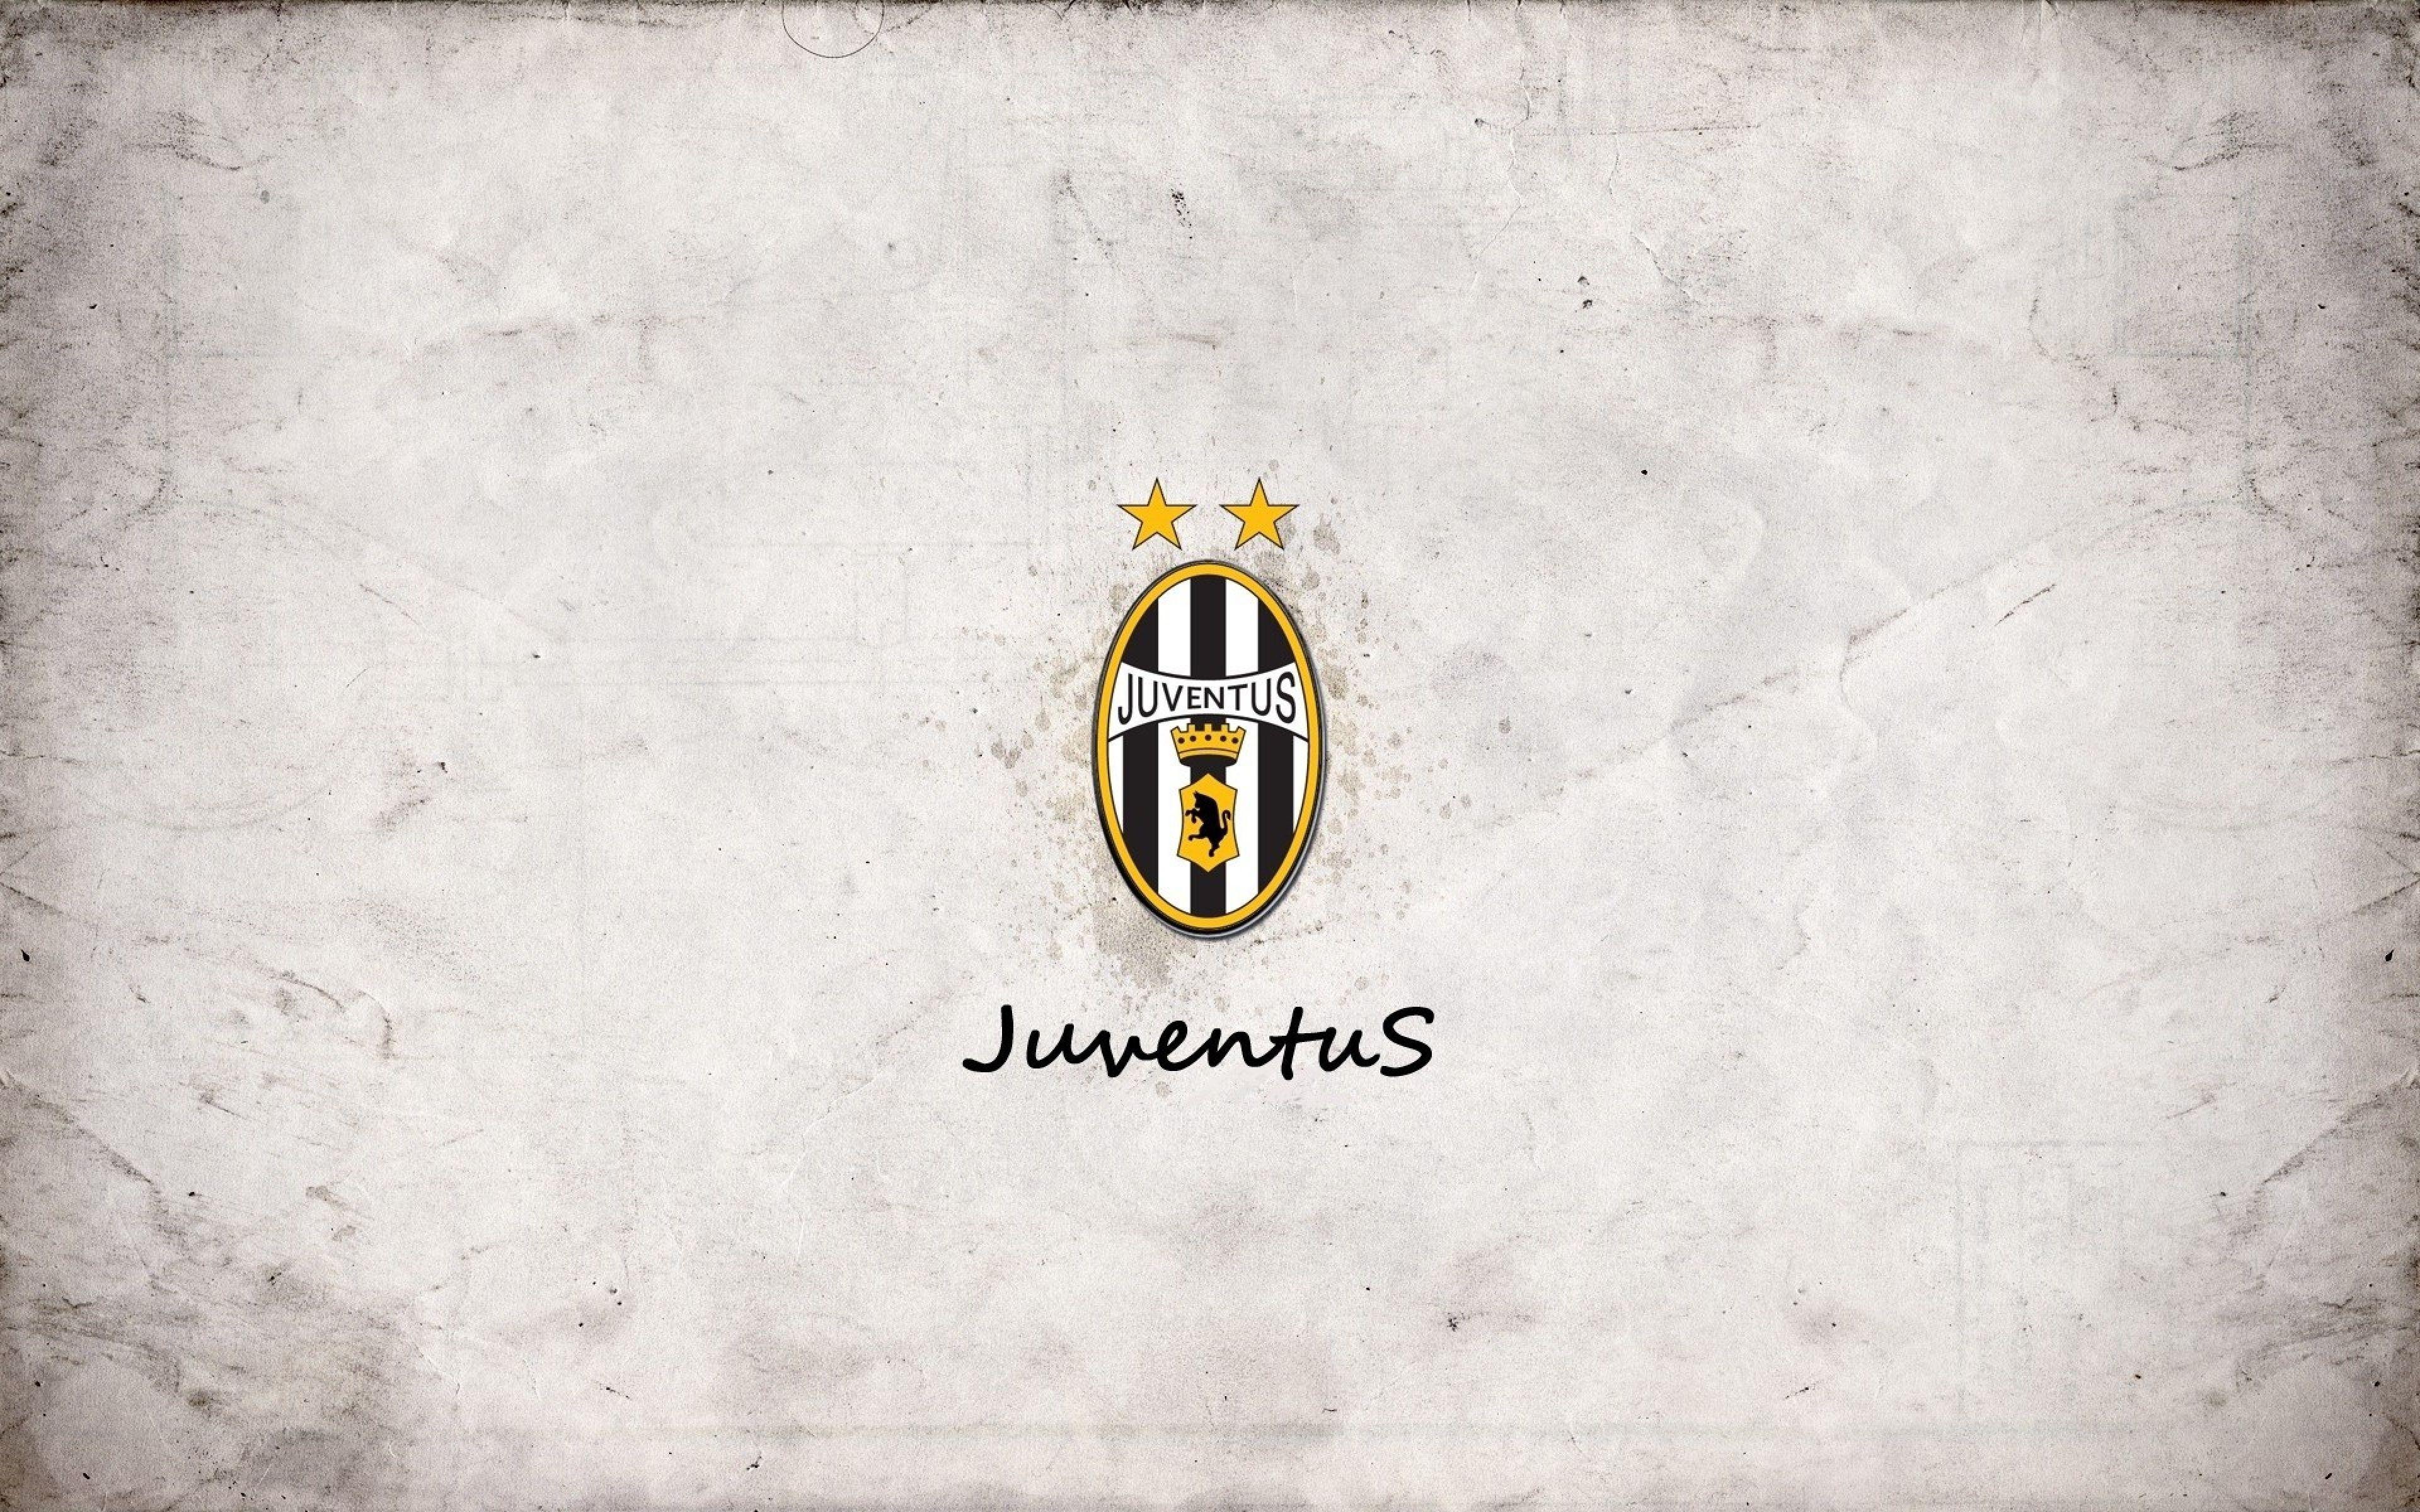 Ultra HD 4K Juventus Wallpapers HD, Desktop Backgrounds 3840x2400 ...